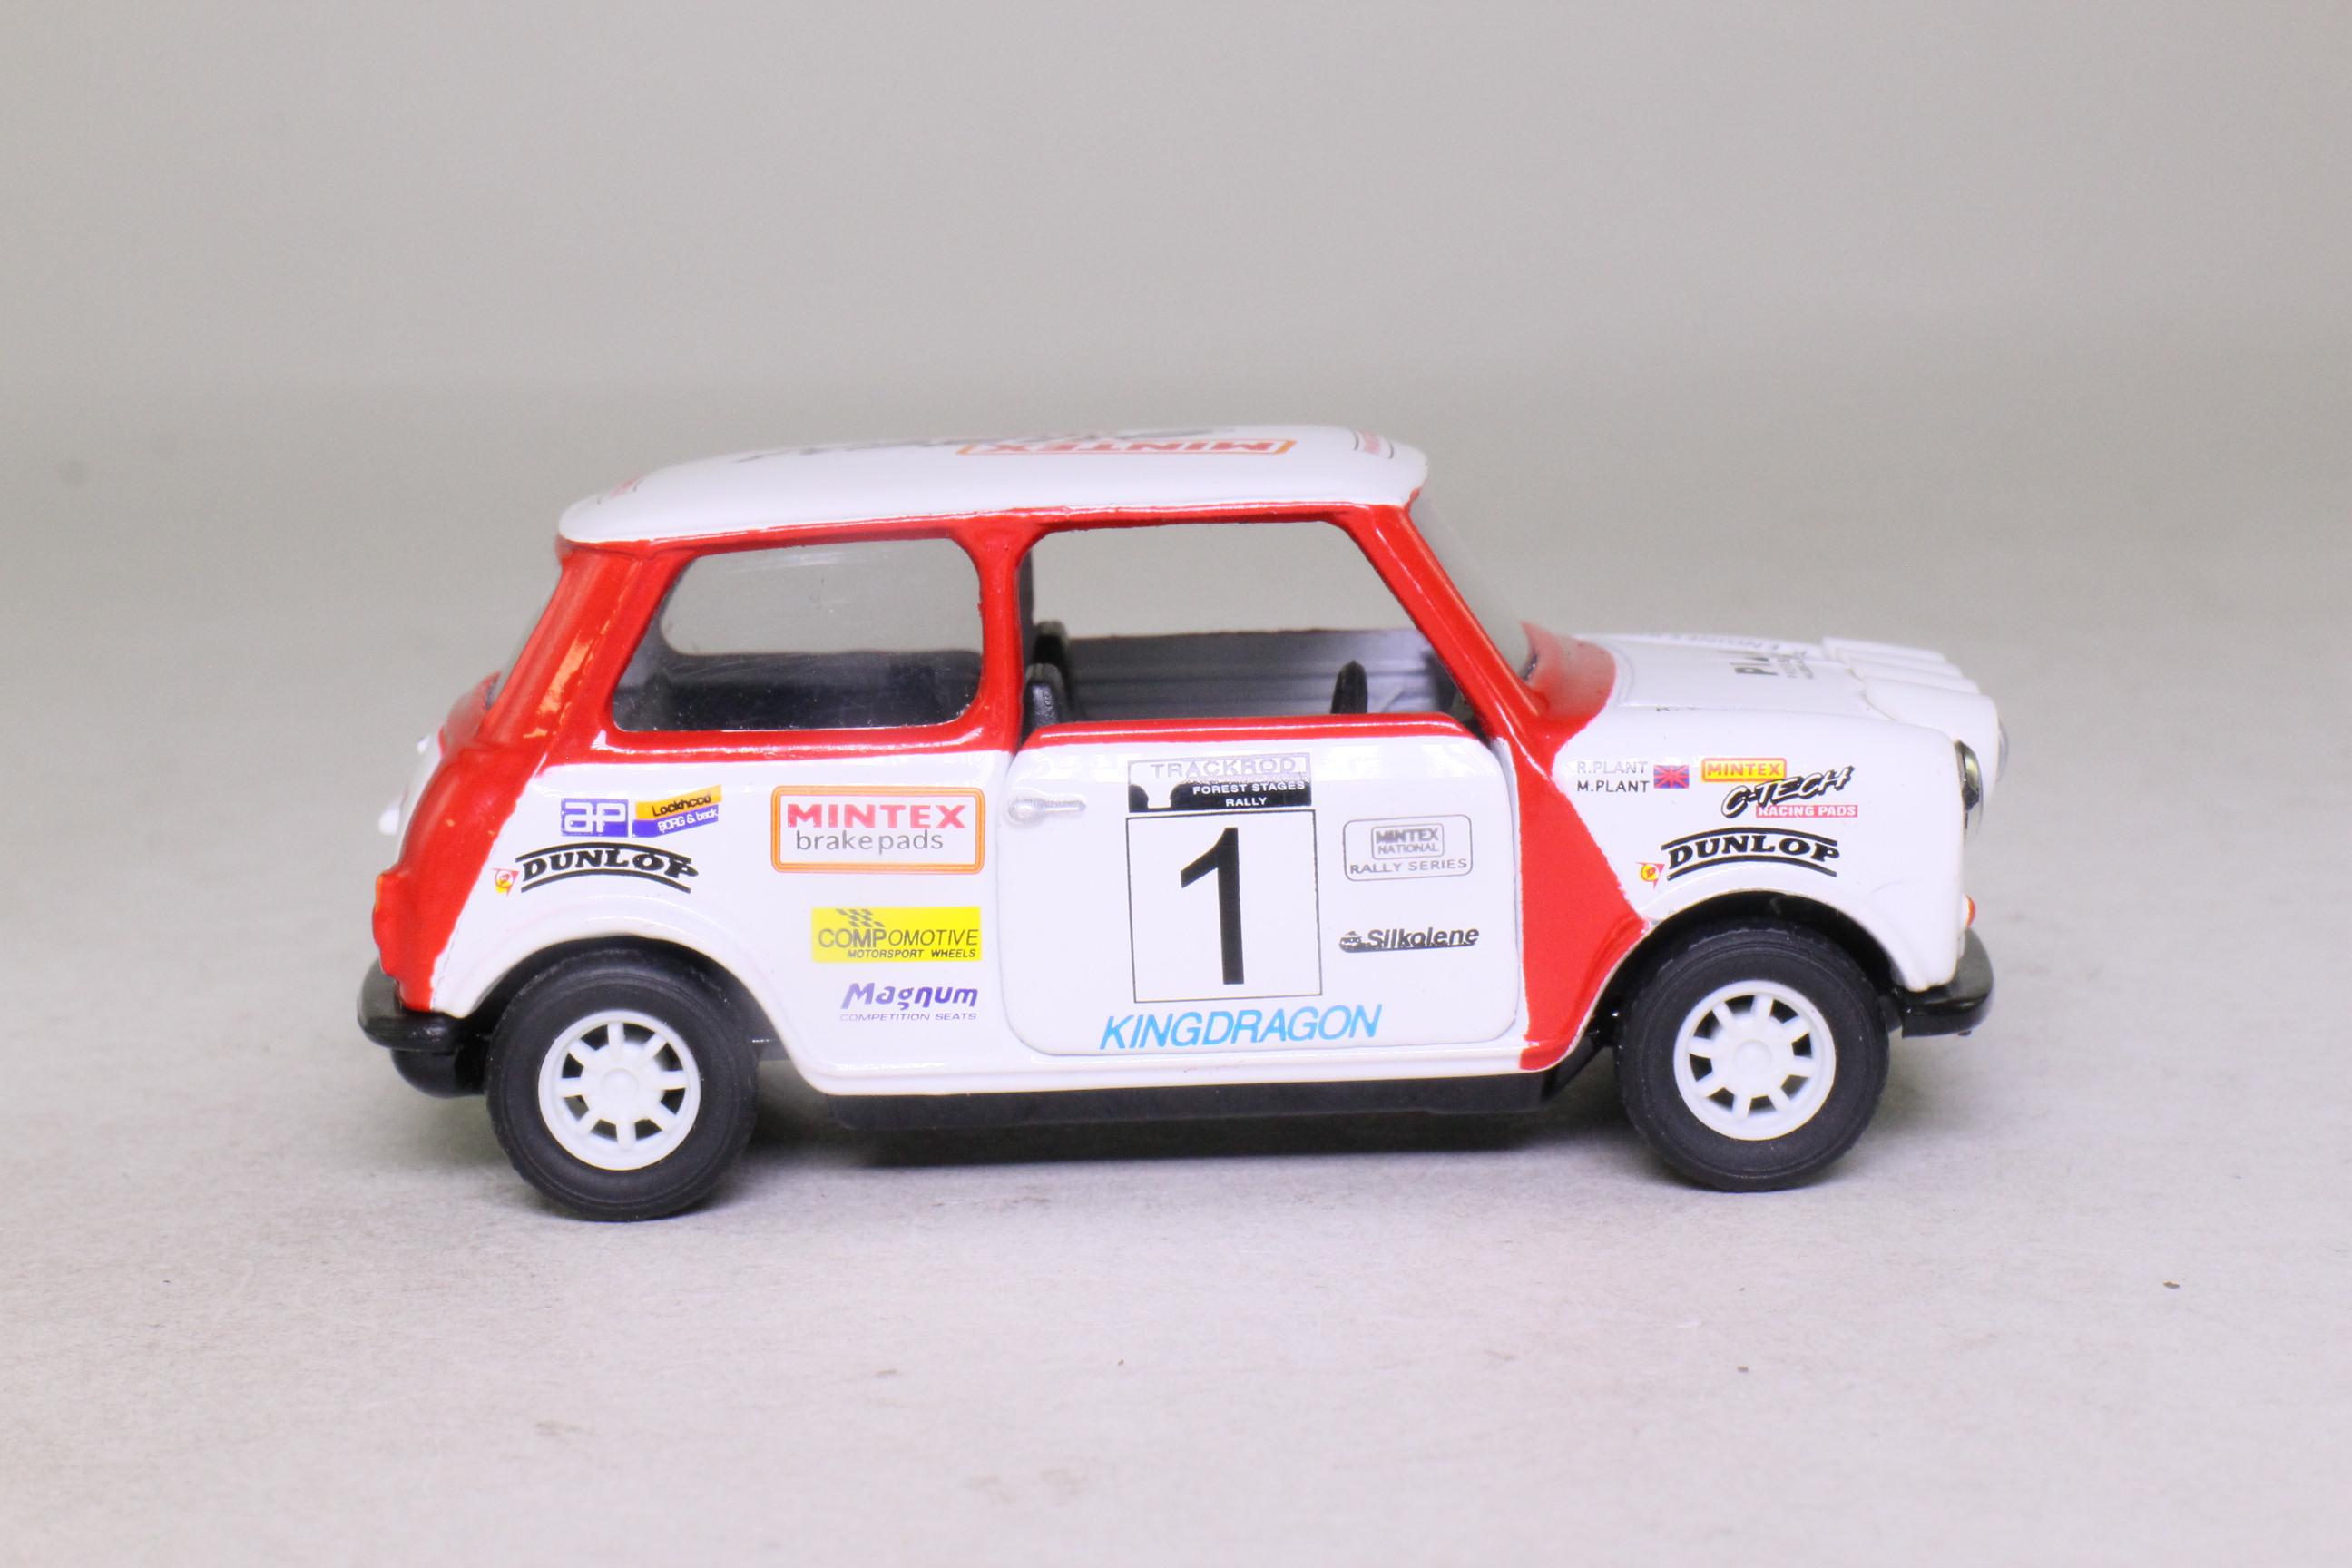 Corgi Classics 04426; BL/Rover Mini; 1998/9 Mintex National Rally